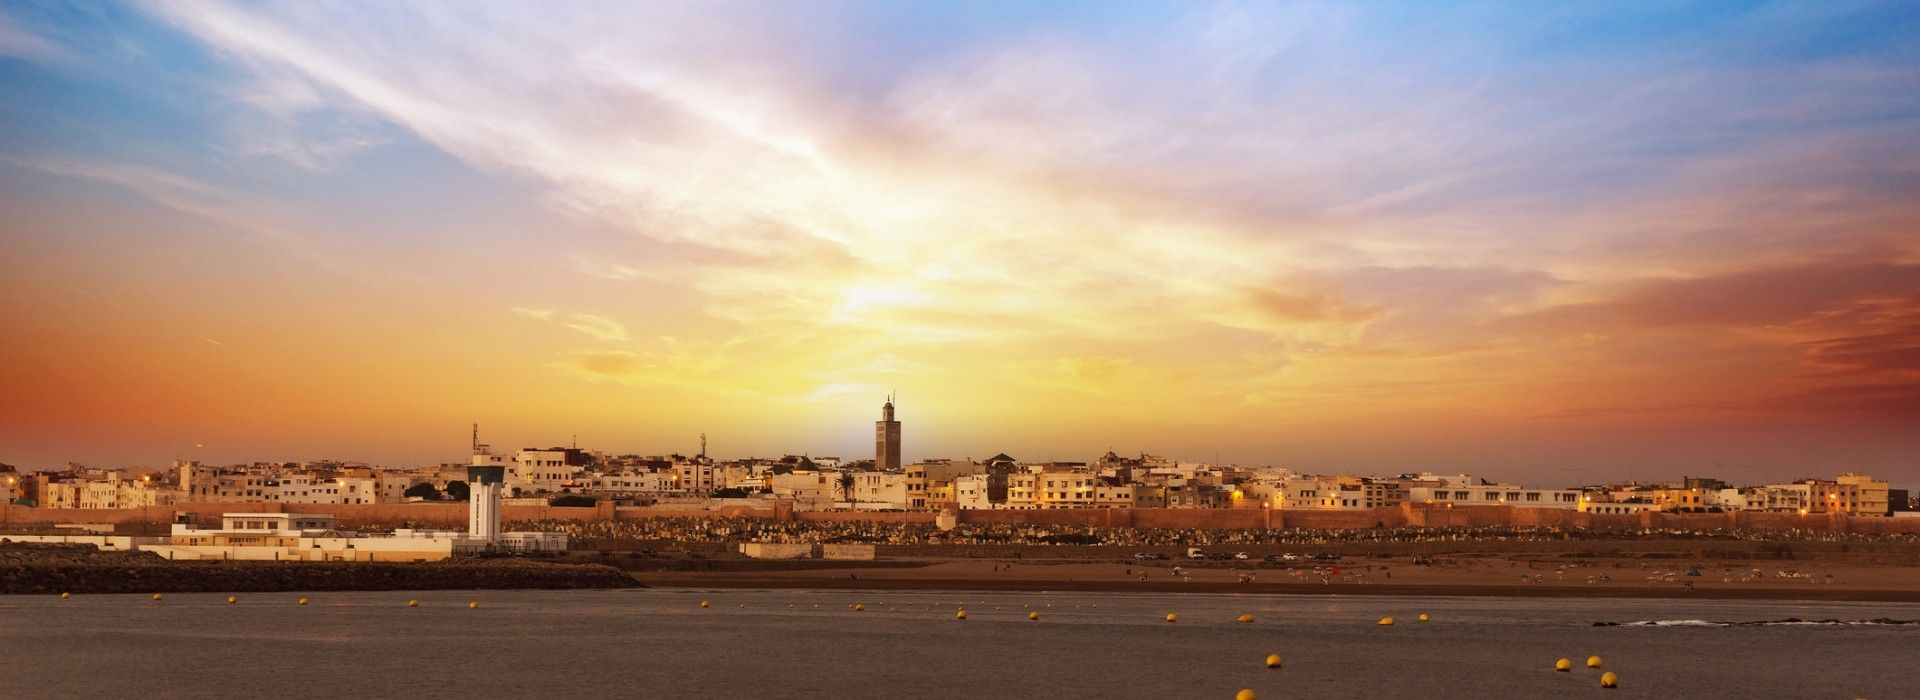 Food tours in Casablanca